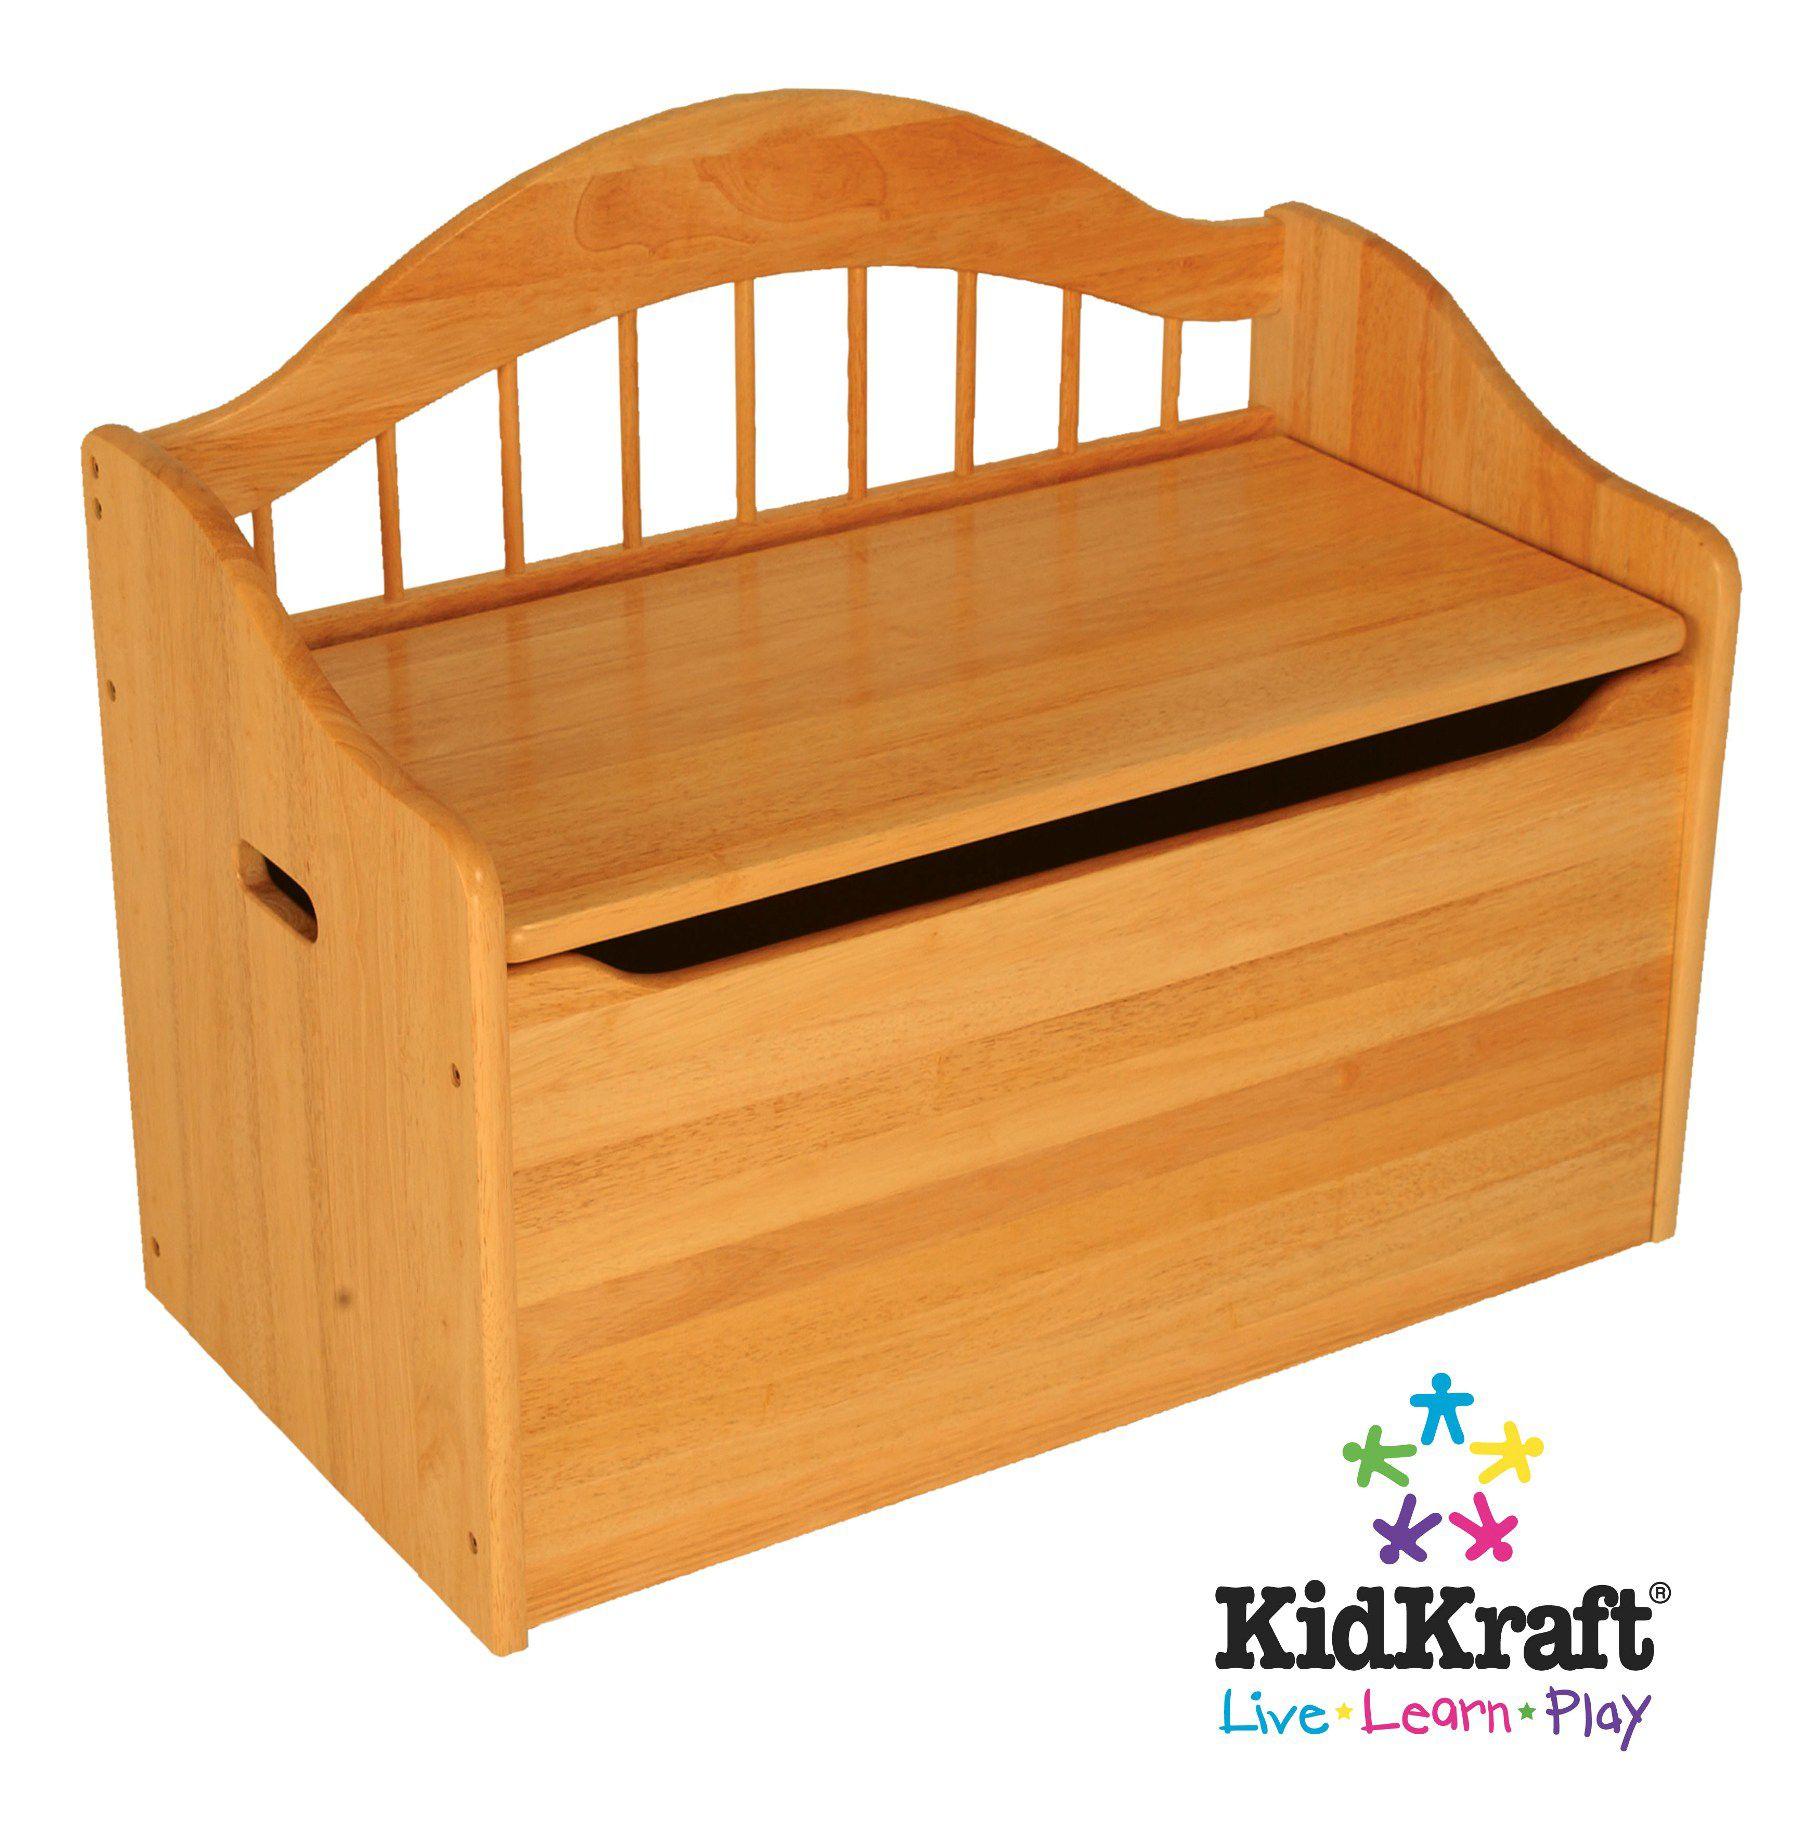 Kidkraft Limited Edition Toy Box Honey